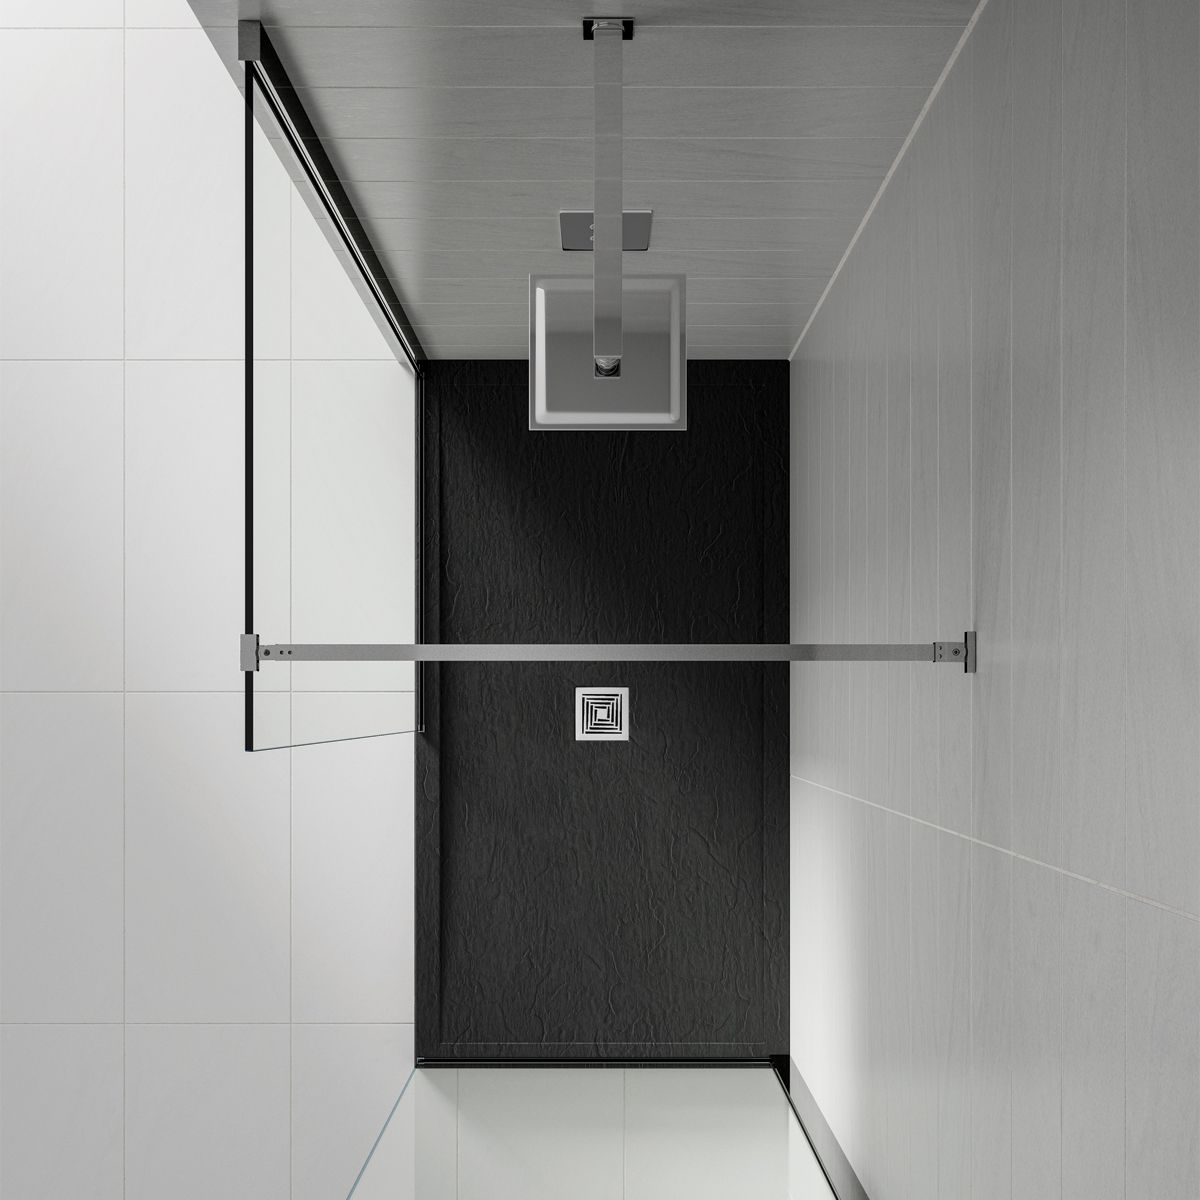 Aquadart Black Slate Shower Tray 1500 x 700 Overhead